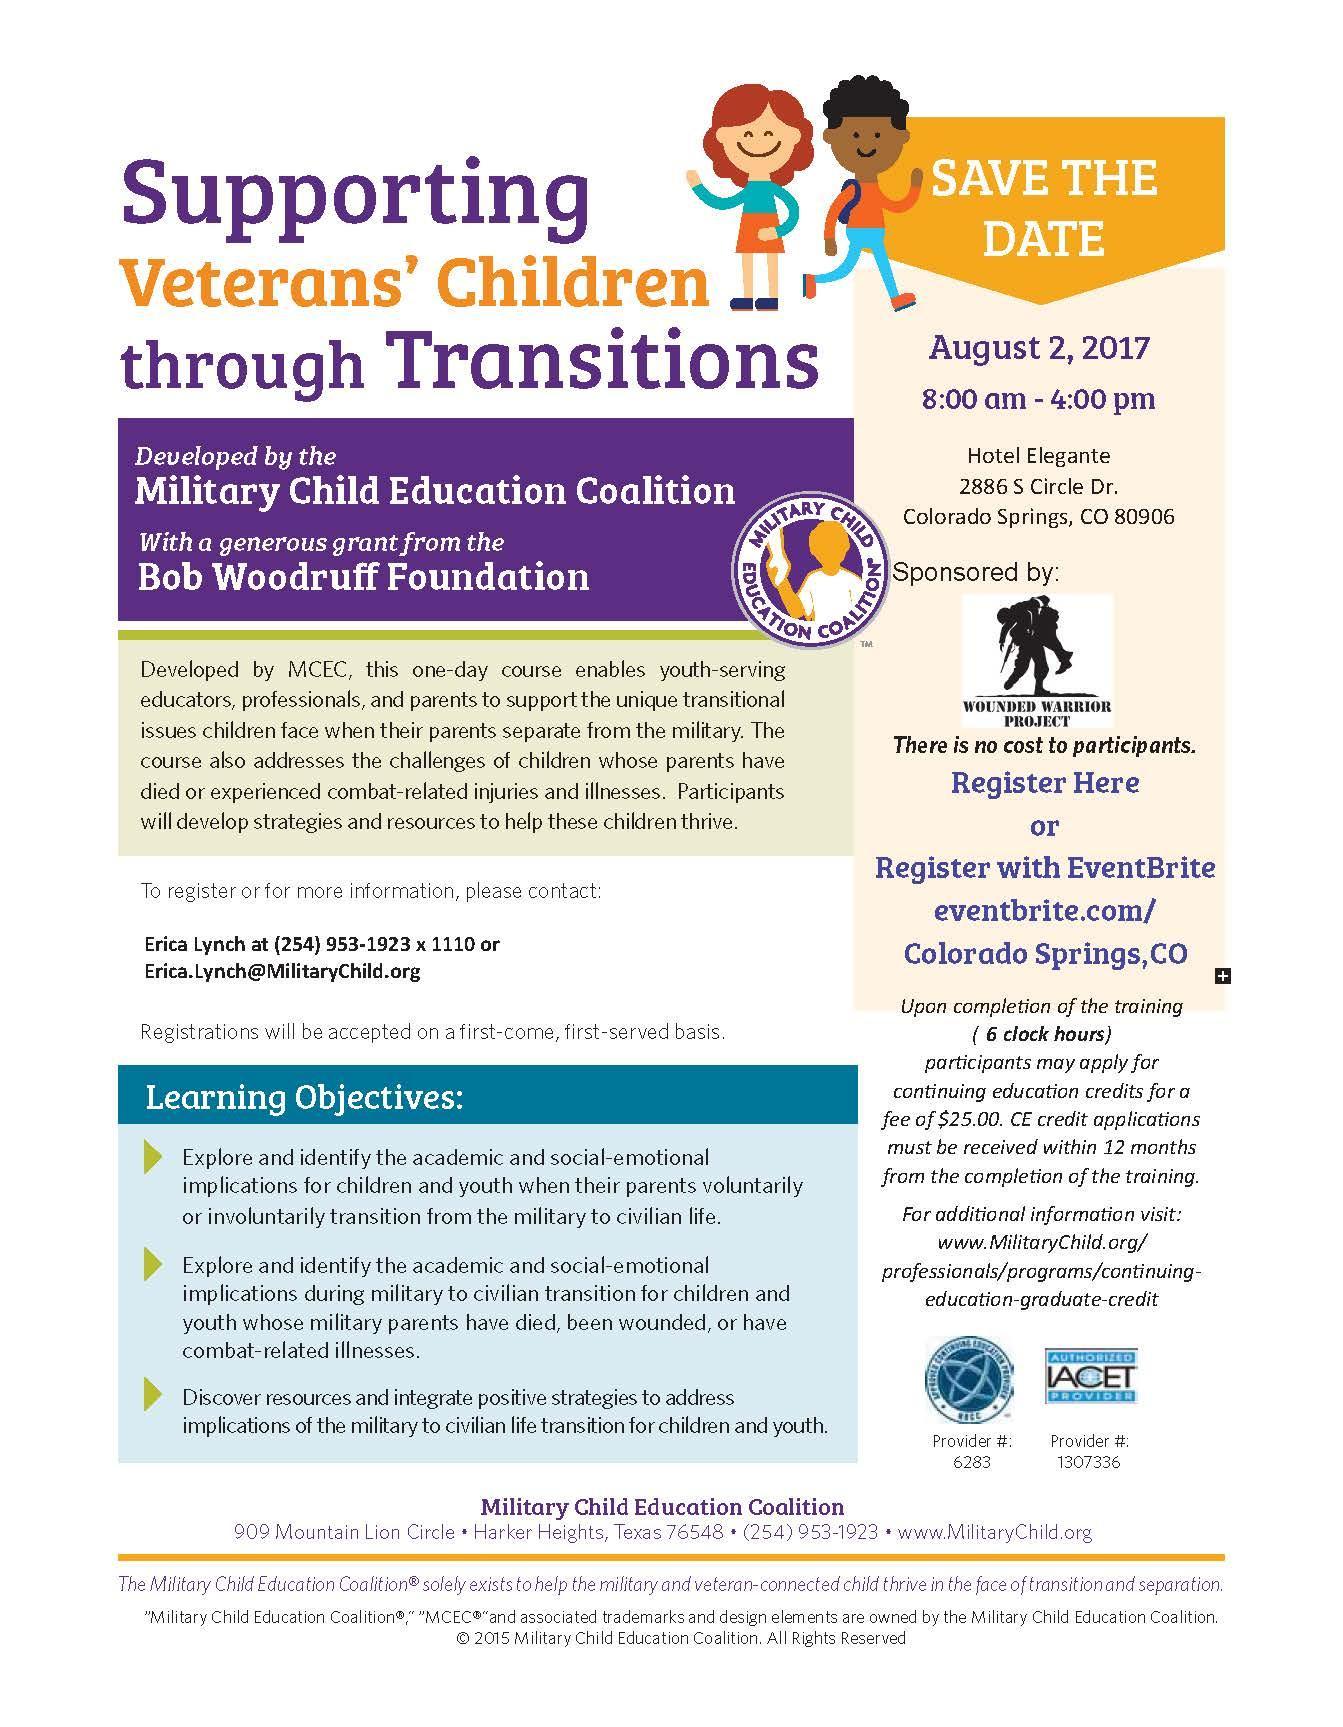 support veterans' children through transitions - colorado springs